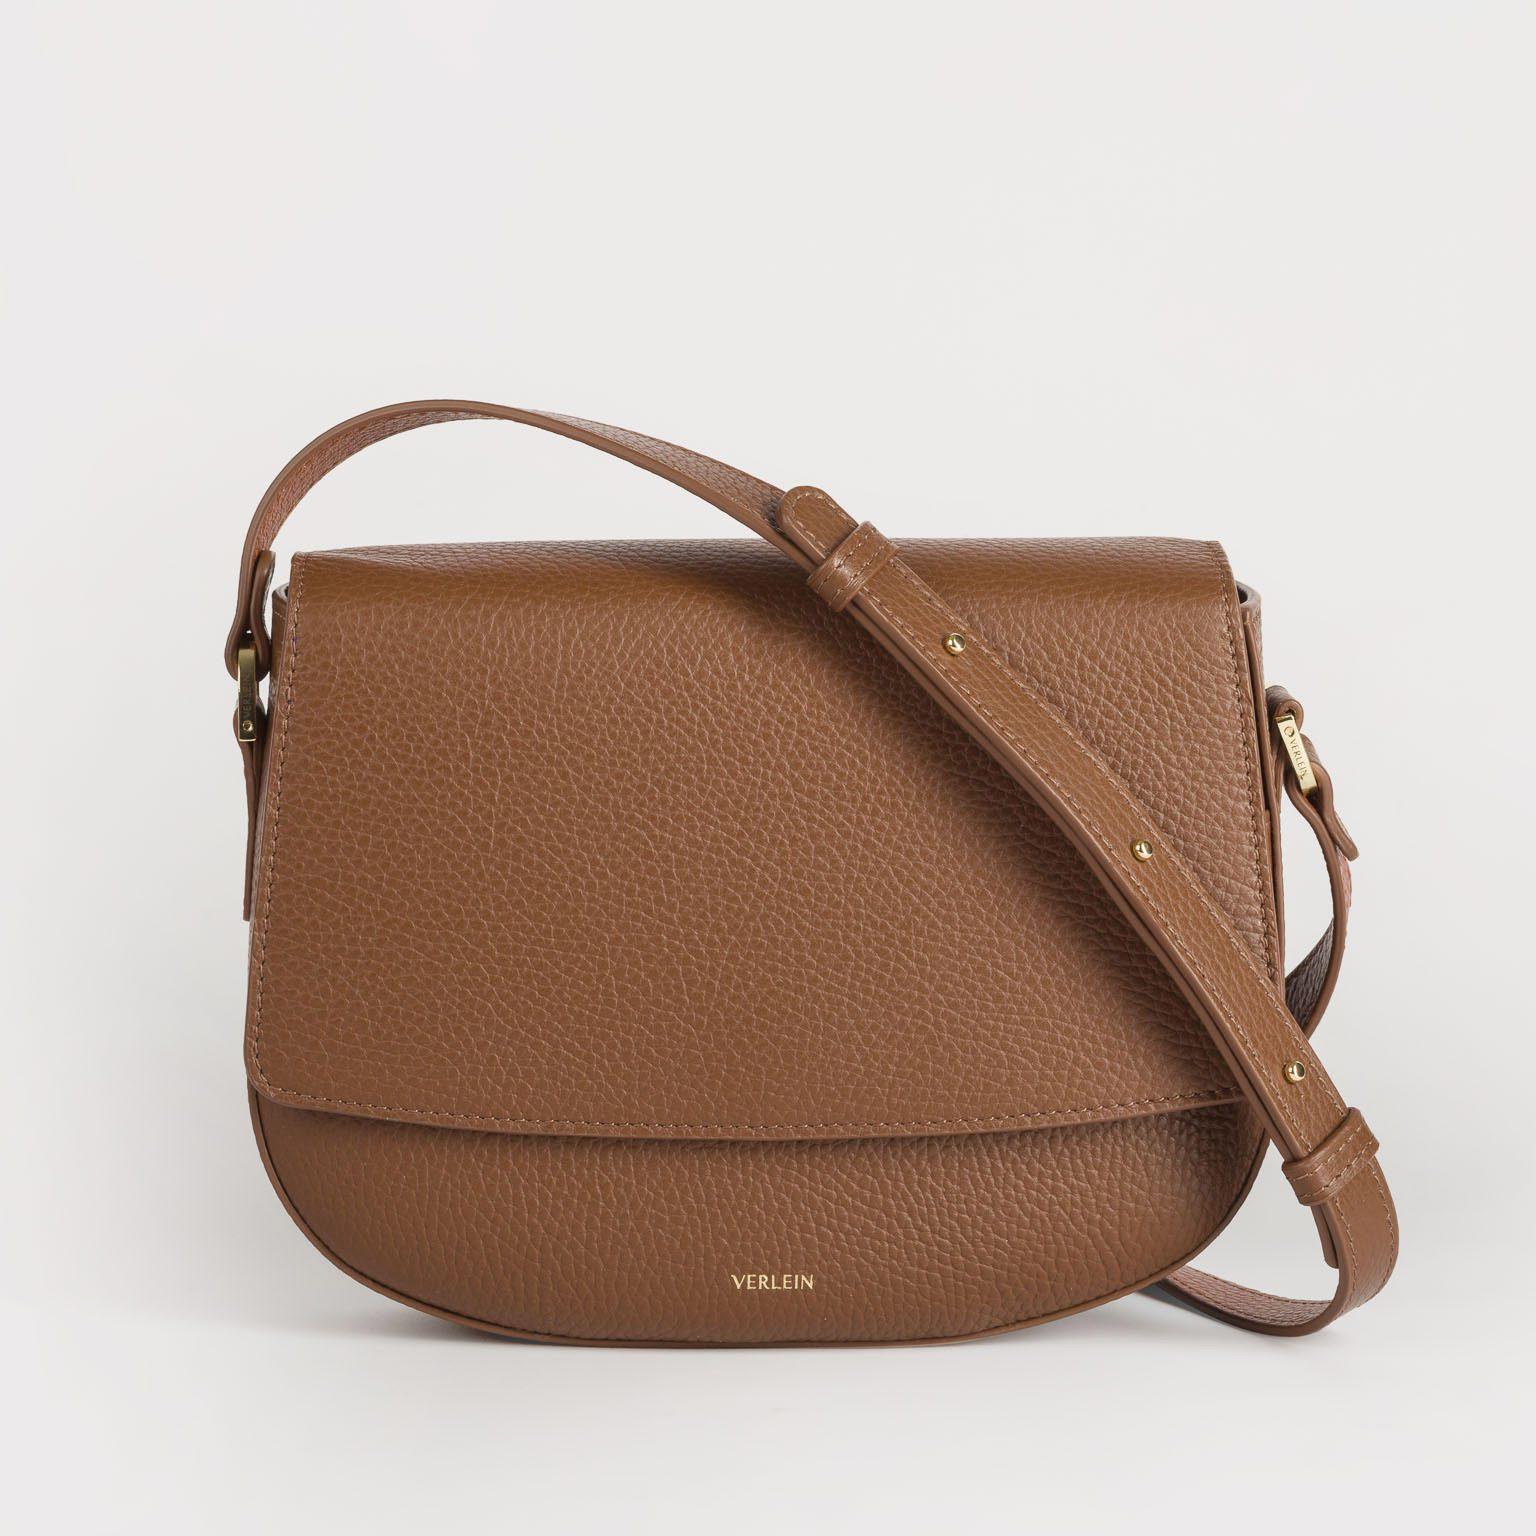 Brown Italian leather crossbody bag handmade by Czech brand Verlein